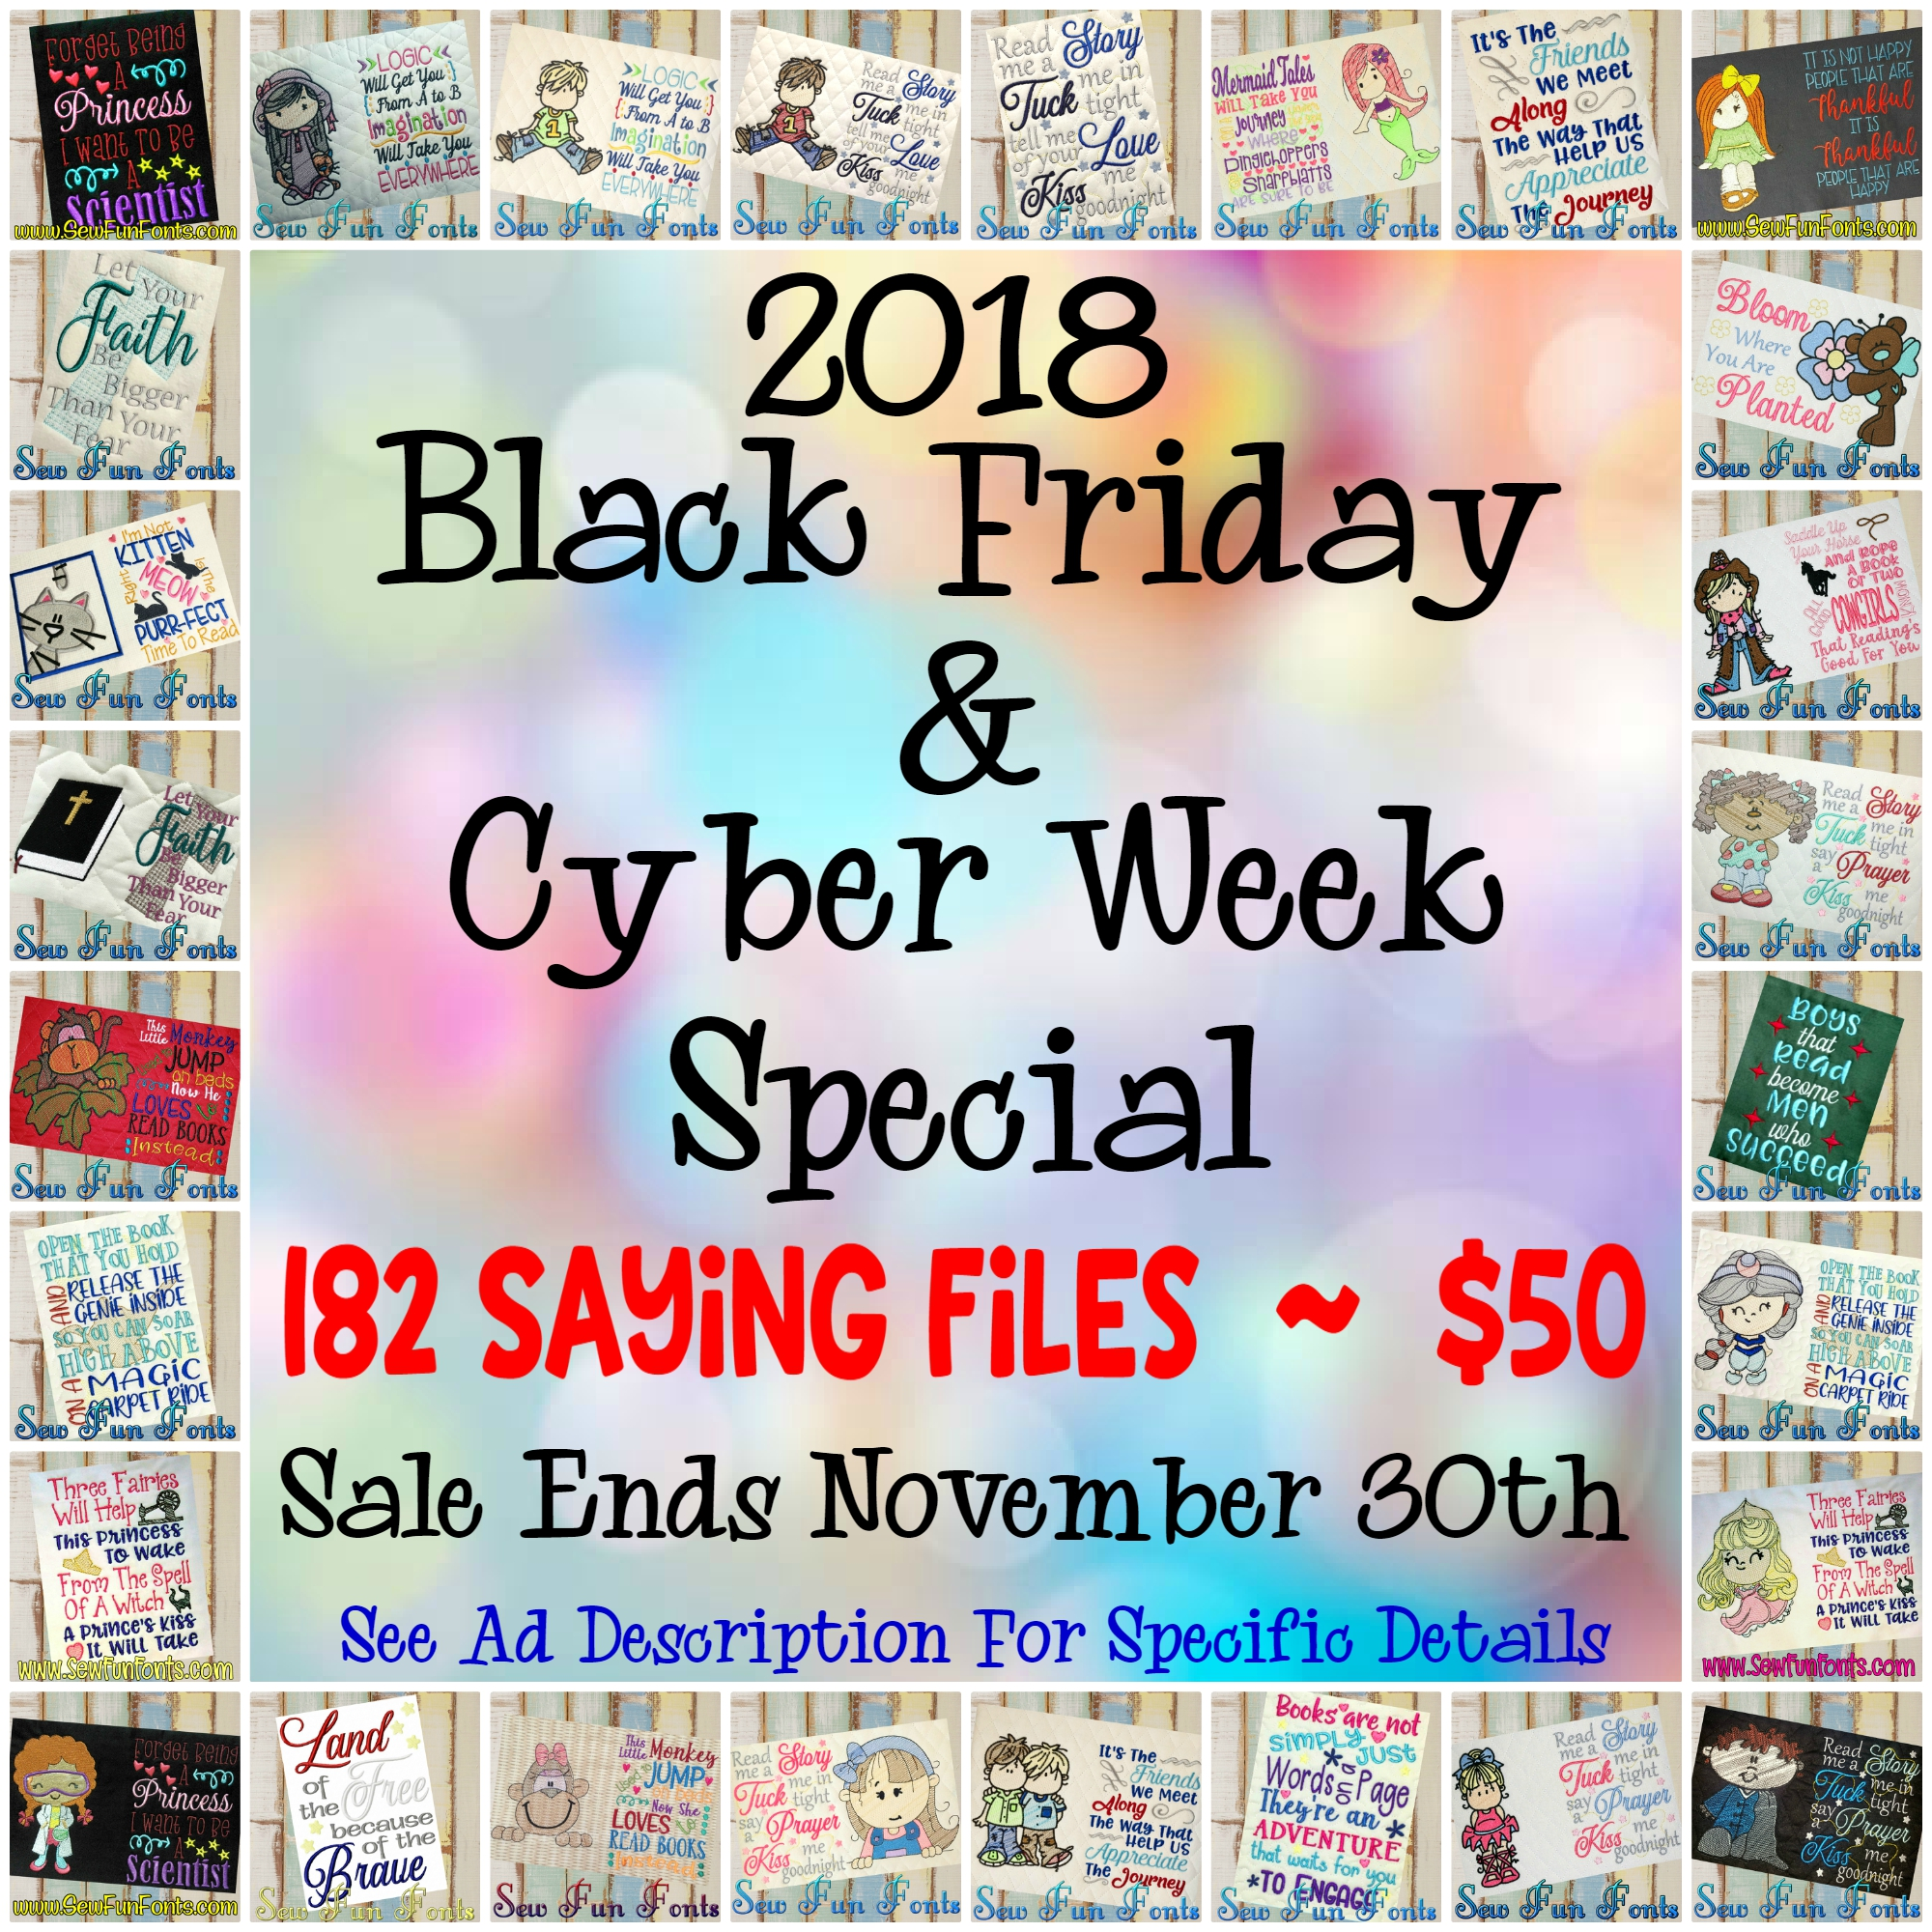 2018 Black Friday Sayings Deal Sew Fun Fonts